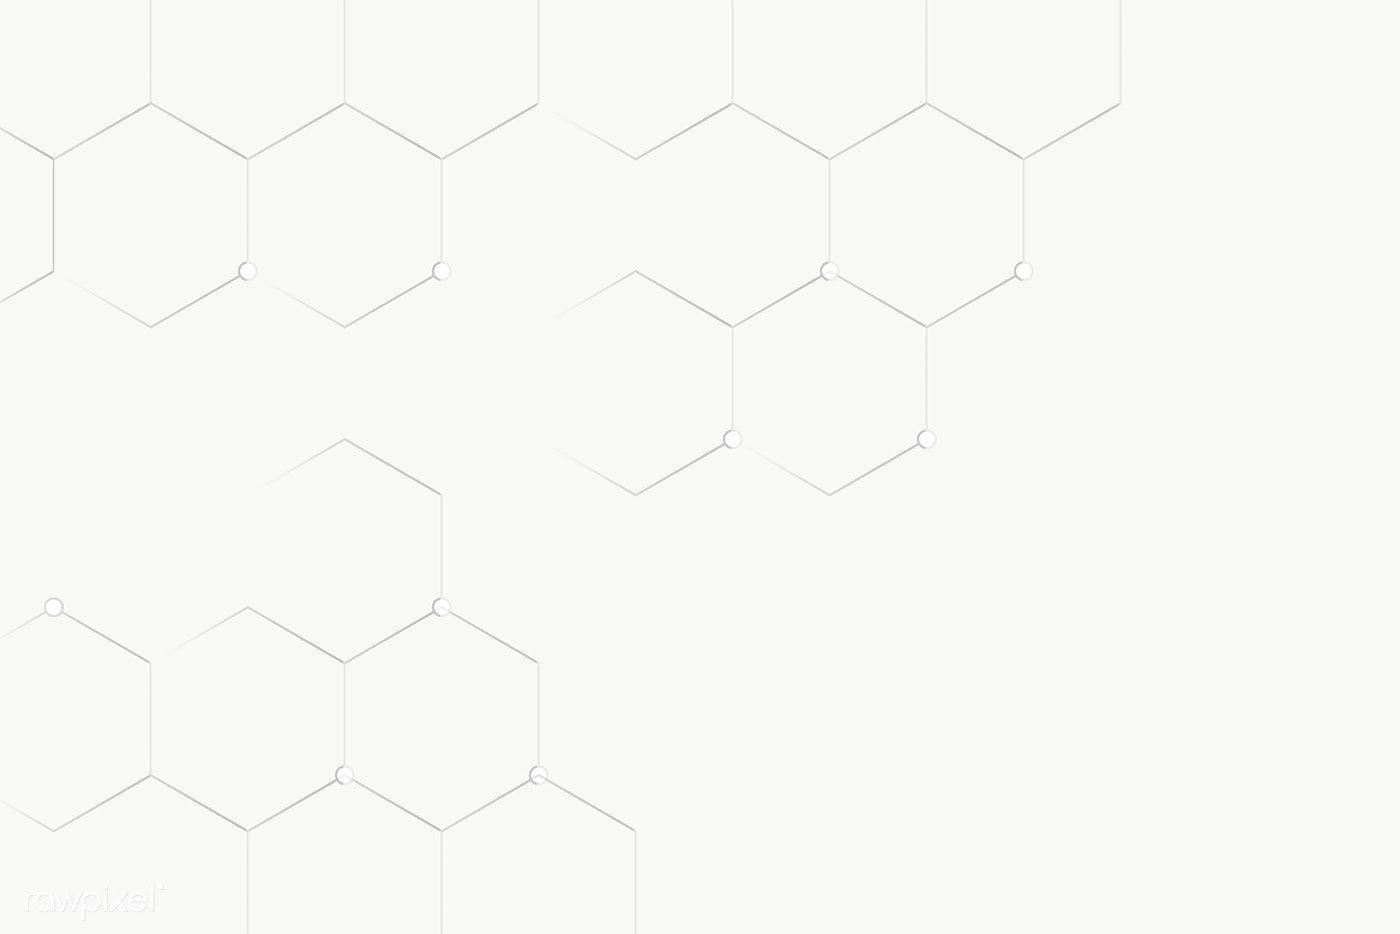 Golden Hexagon Frame Transparent Png Premium Image By Rawpixel Com Adj Phone Wallpaper Design Iphone Wallpaper Vintage Quotes Flower Graphic Design